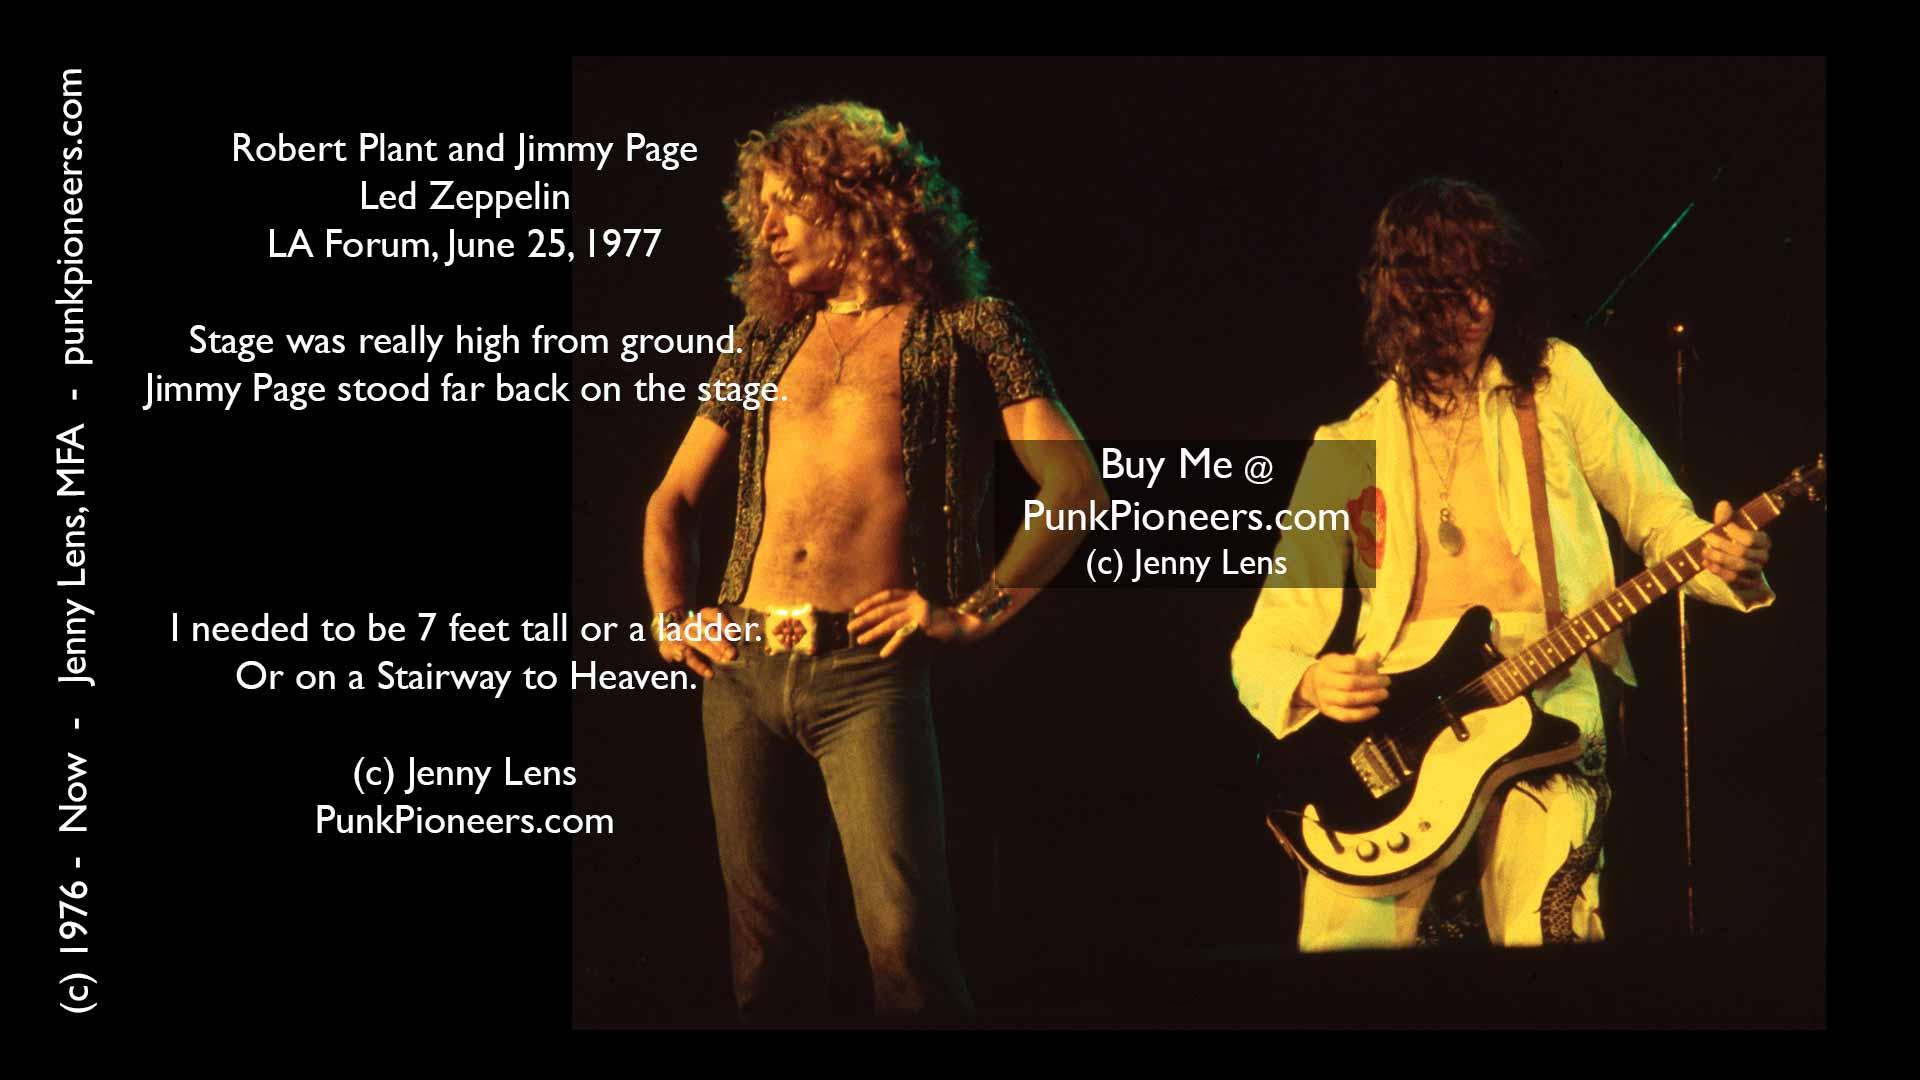 Led Zeppelin, Robert Plant, Jimmy Page, LA Forum, June 25, 1977, Jenny Lens, PunkPioneers.com